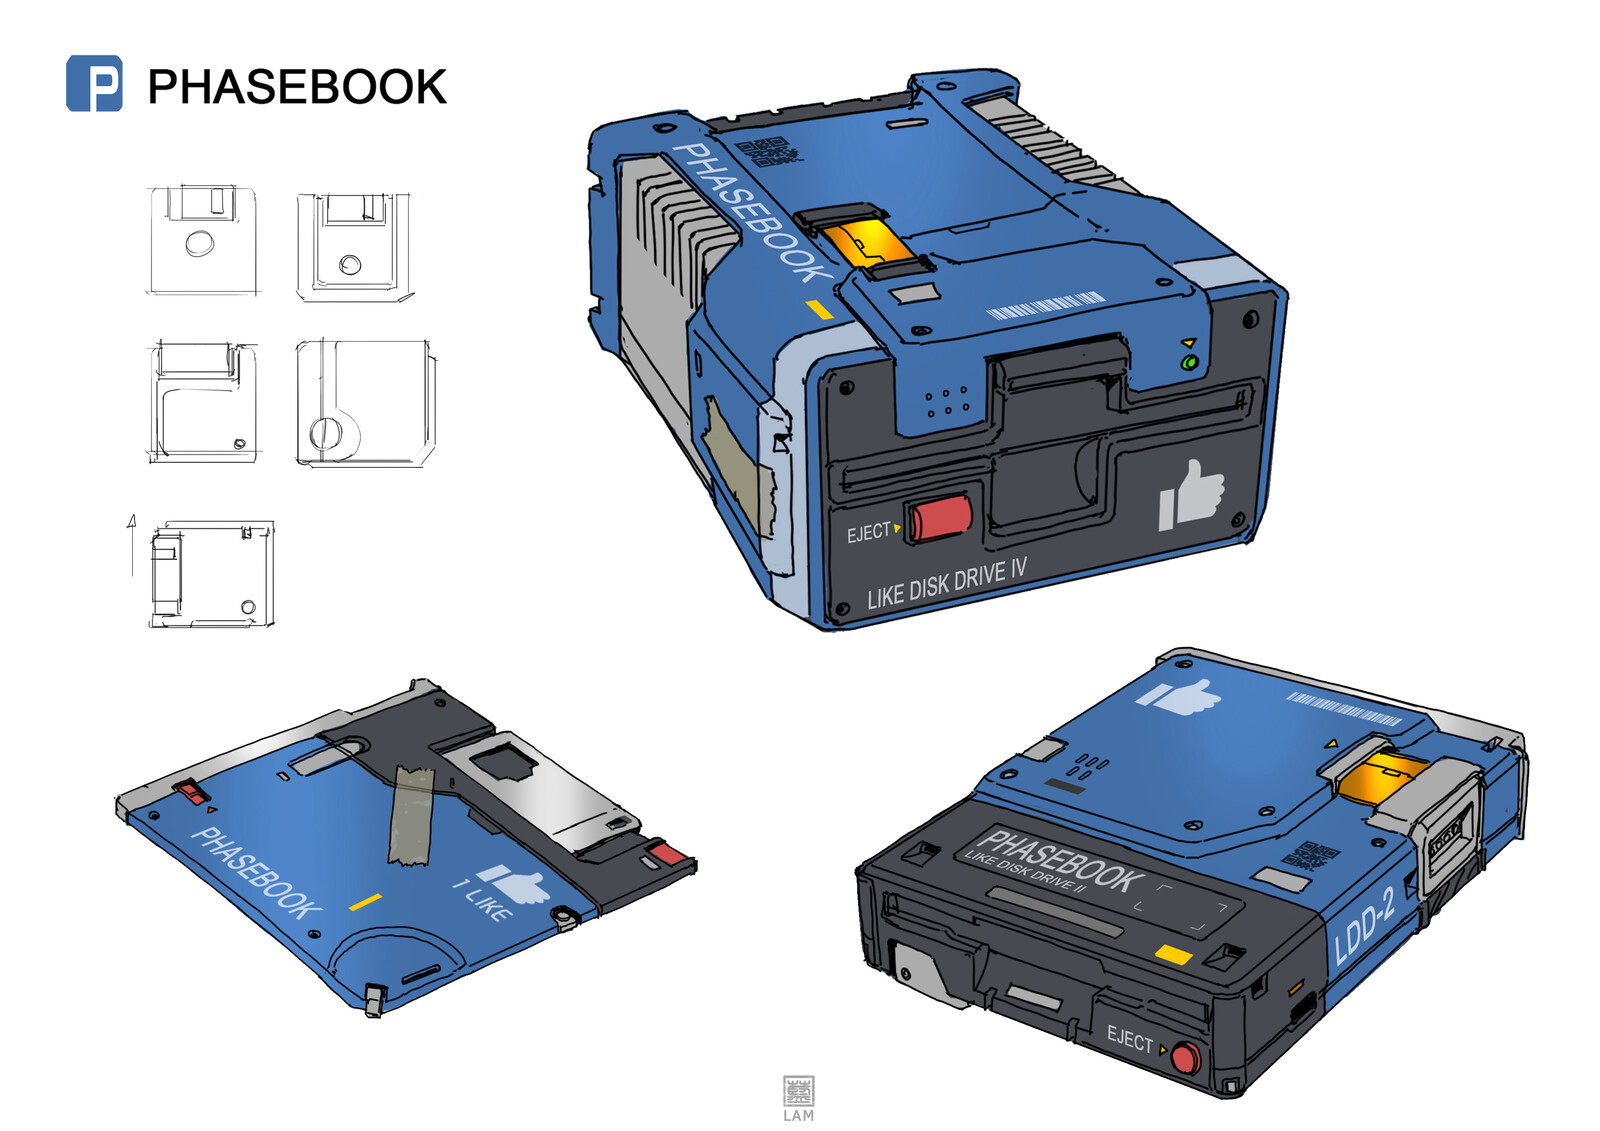 facebook / floppy disk